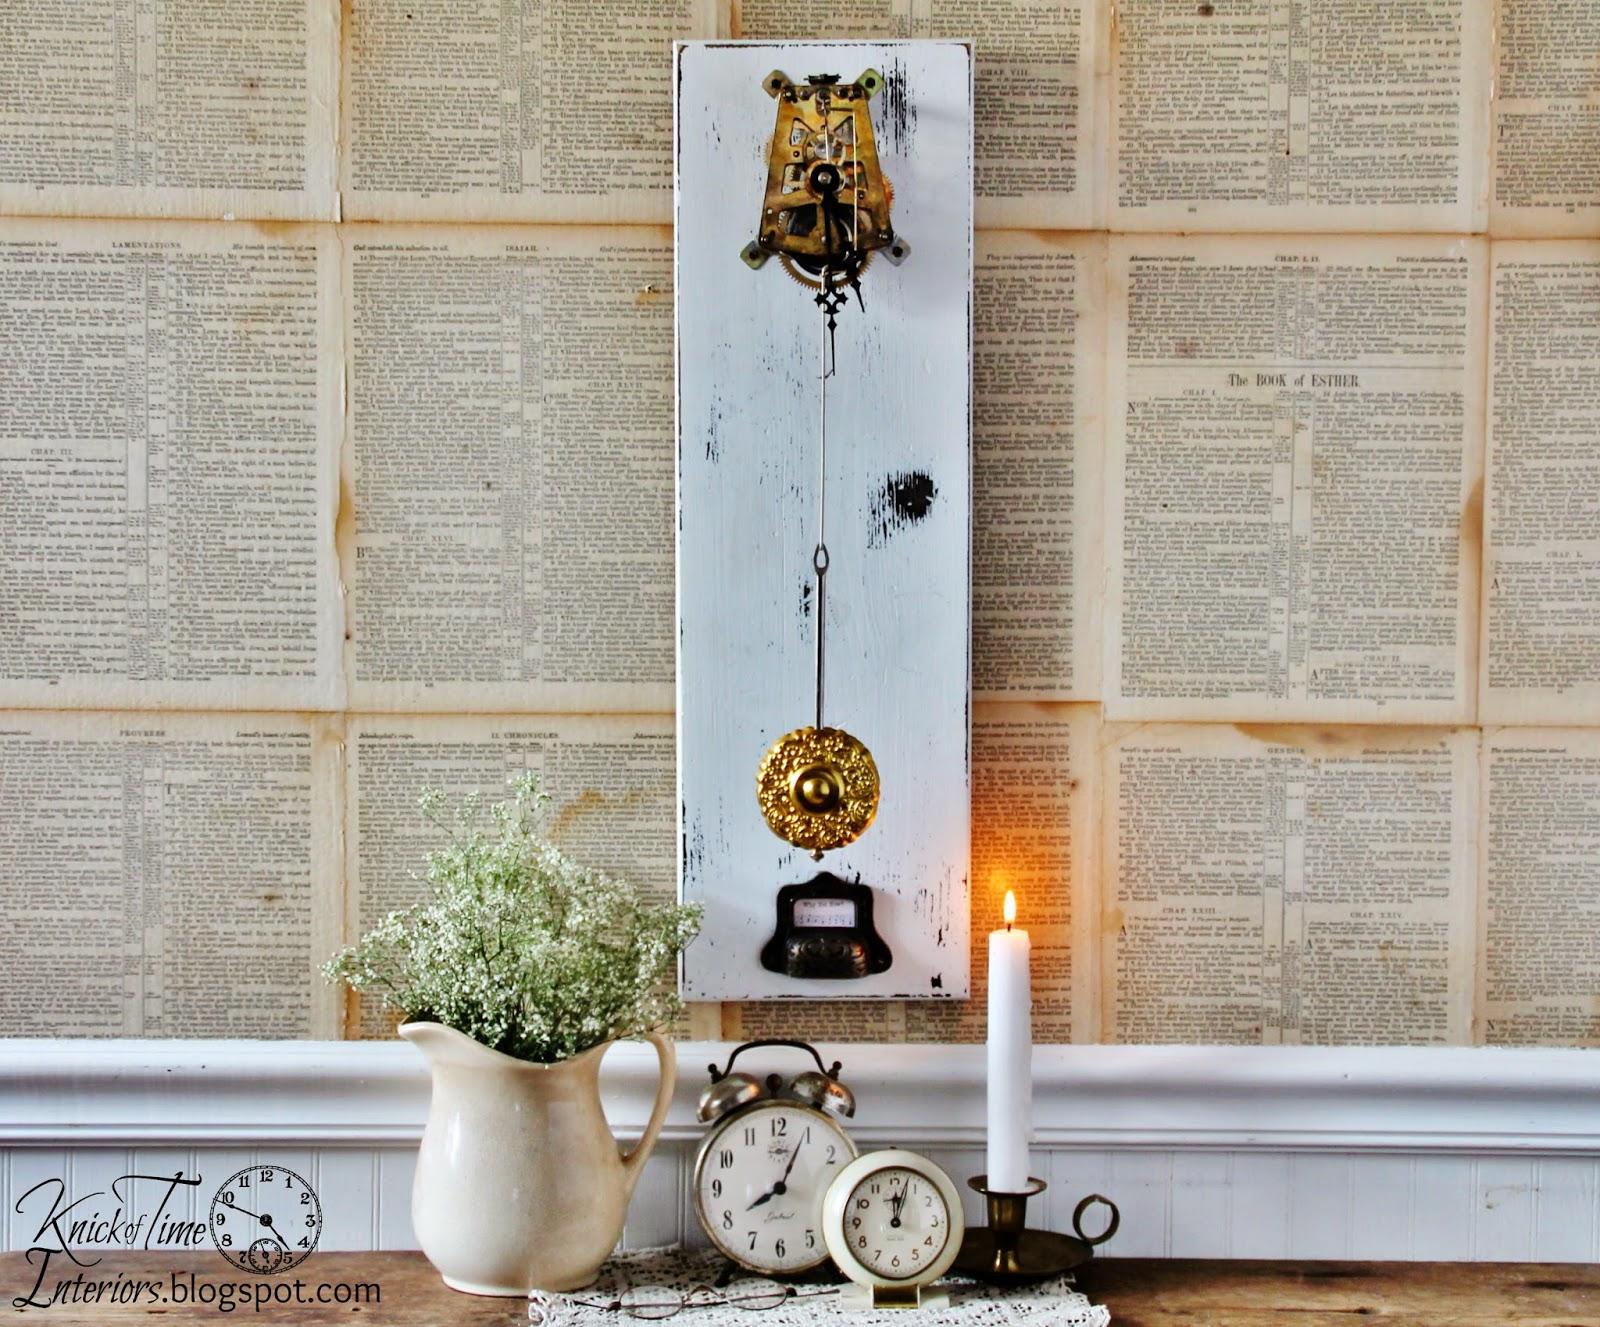 Repurposed Clock Parts Mechanical Gear Train Wall Art via Knick of Time & Repurposed Clock Gears Wall Art   Knick of Time